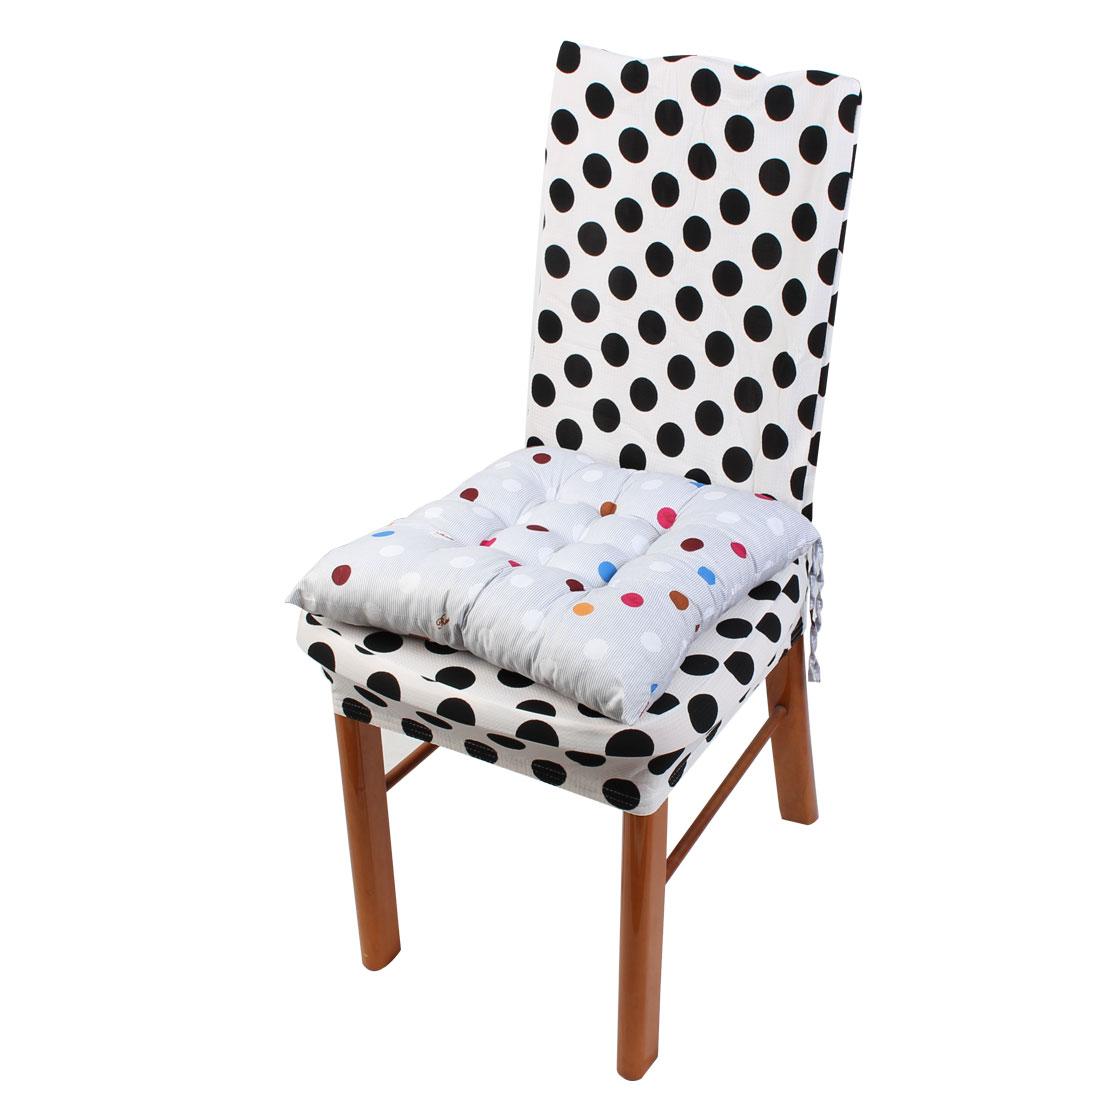 Household Polyester Dots Print Keeping Warm Chair Cushion Pad Gray 40 x 40cm